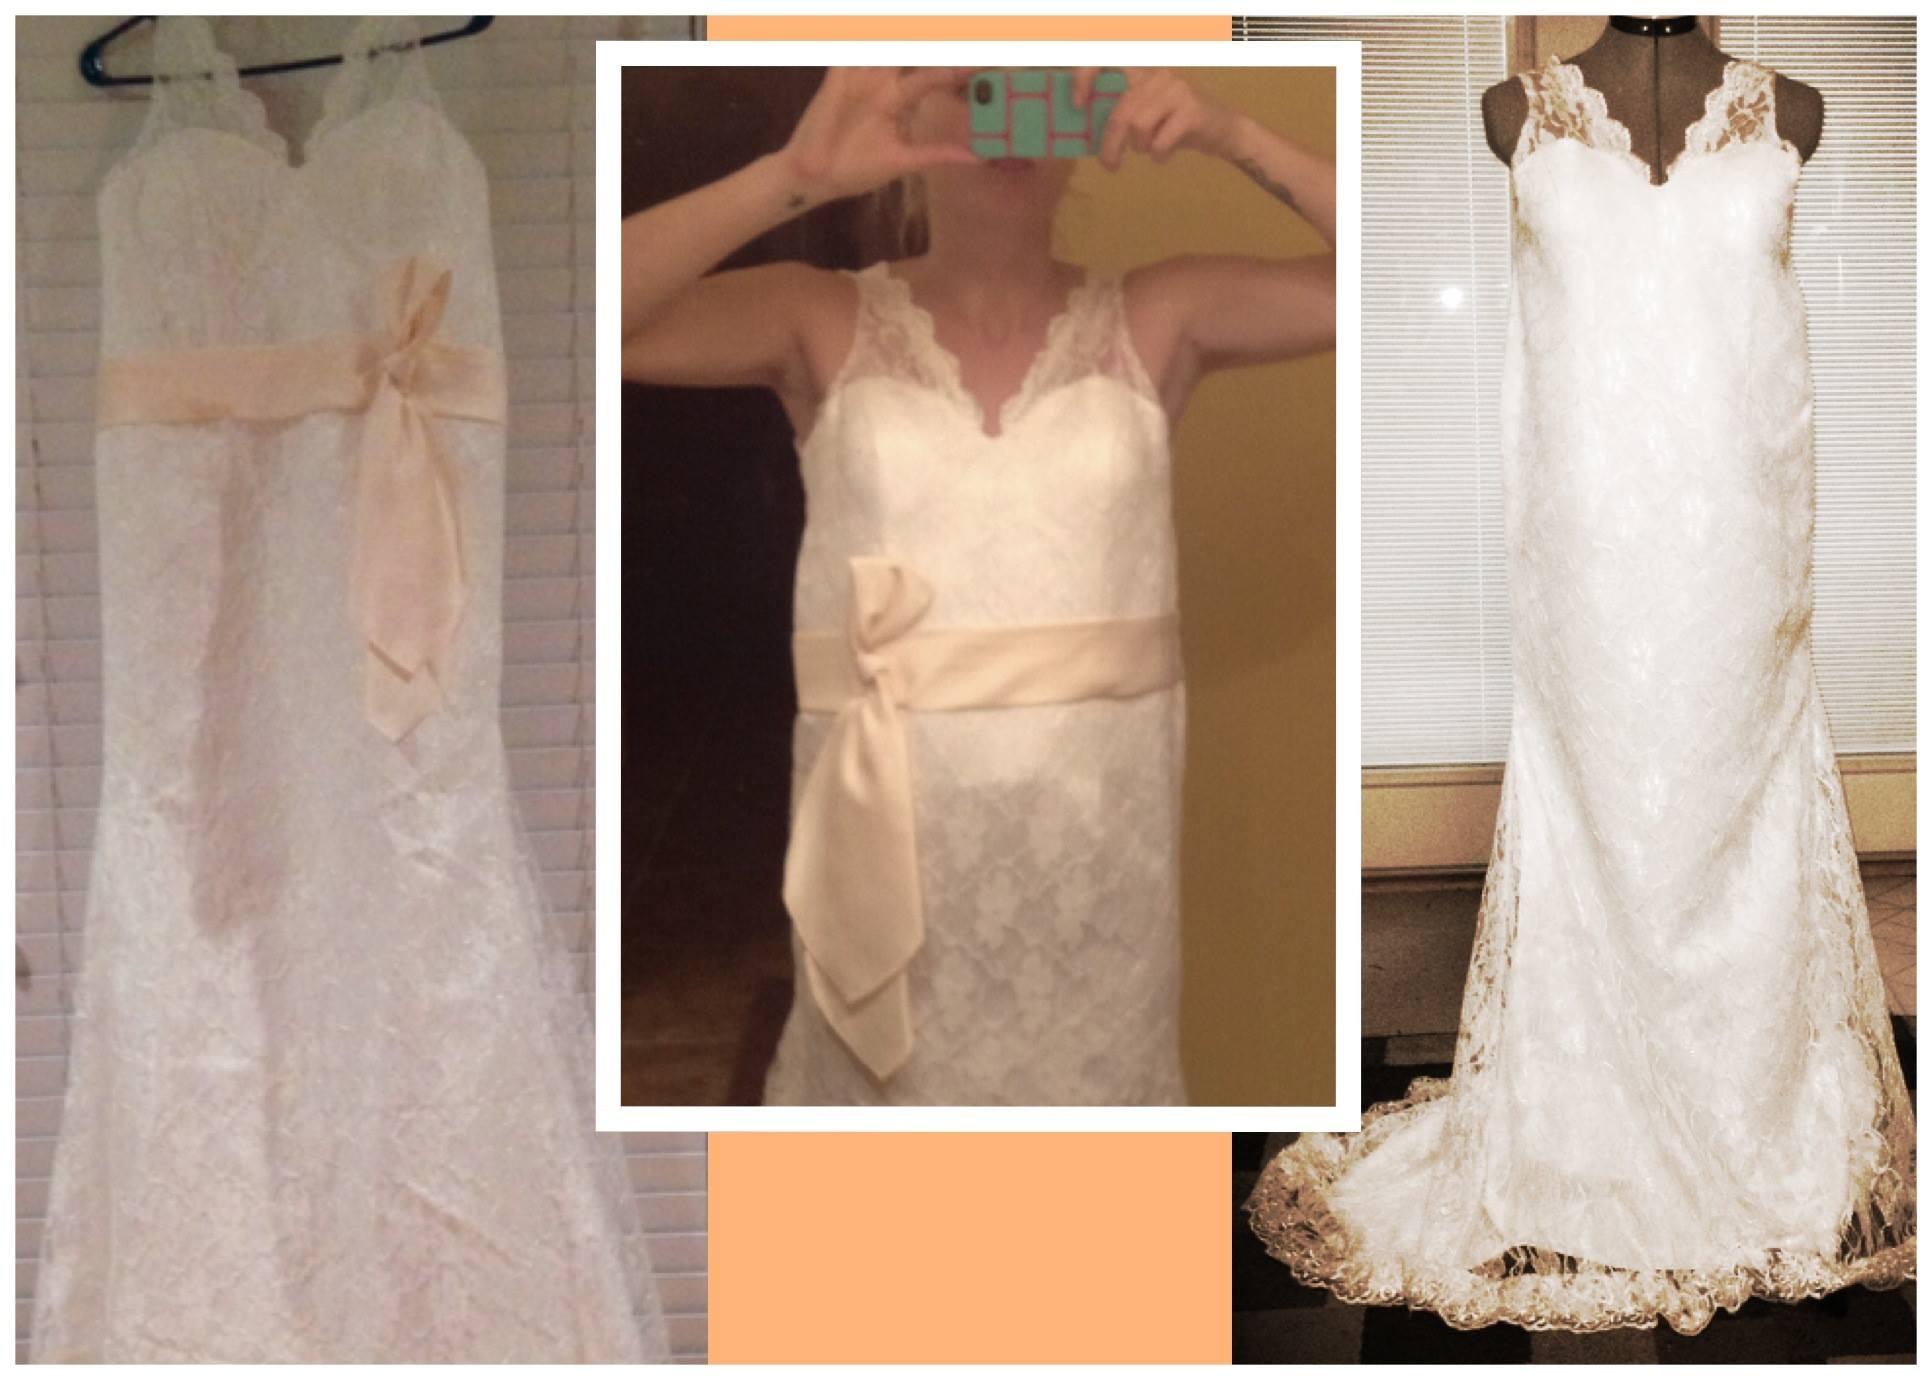 Jessica's wedding dress before